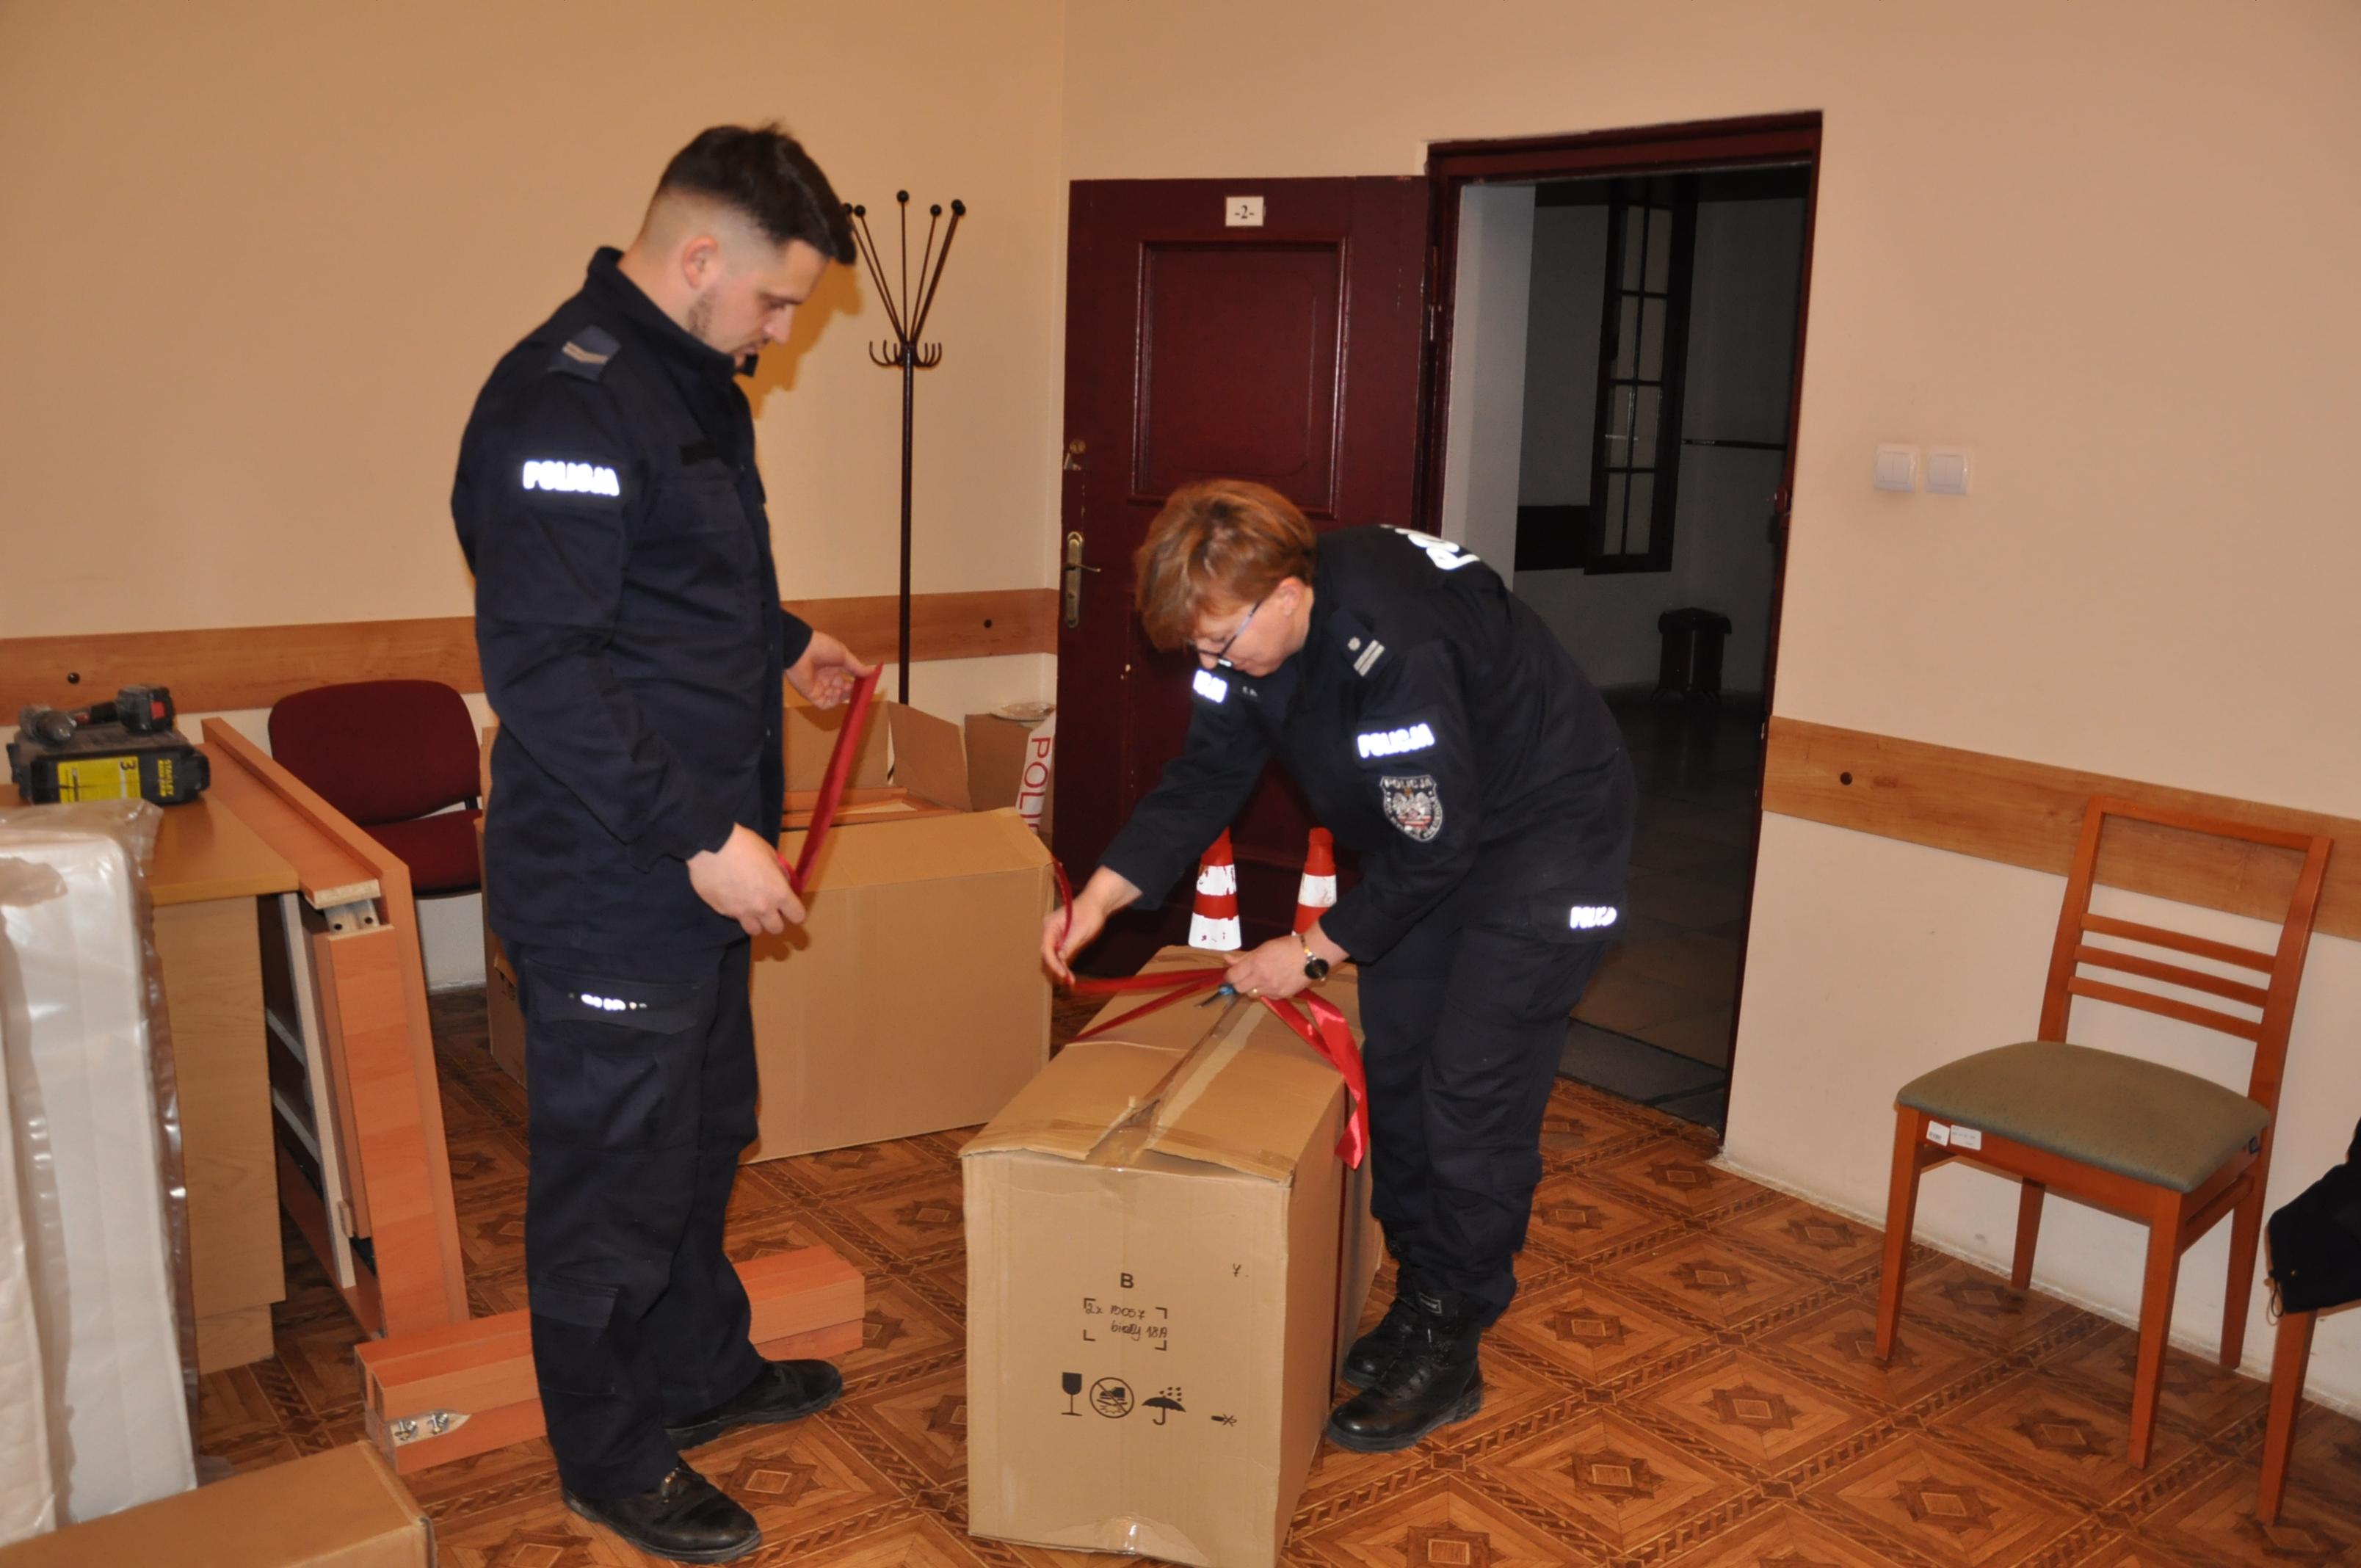 http://m.wm.pl/2019/12/orig/0000079532-policjanci-pakuja-prezenty-596471.jpg